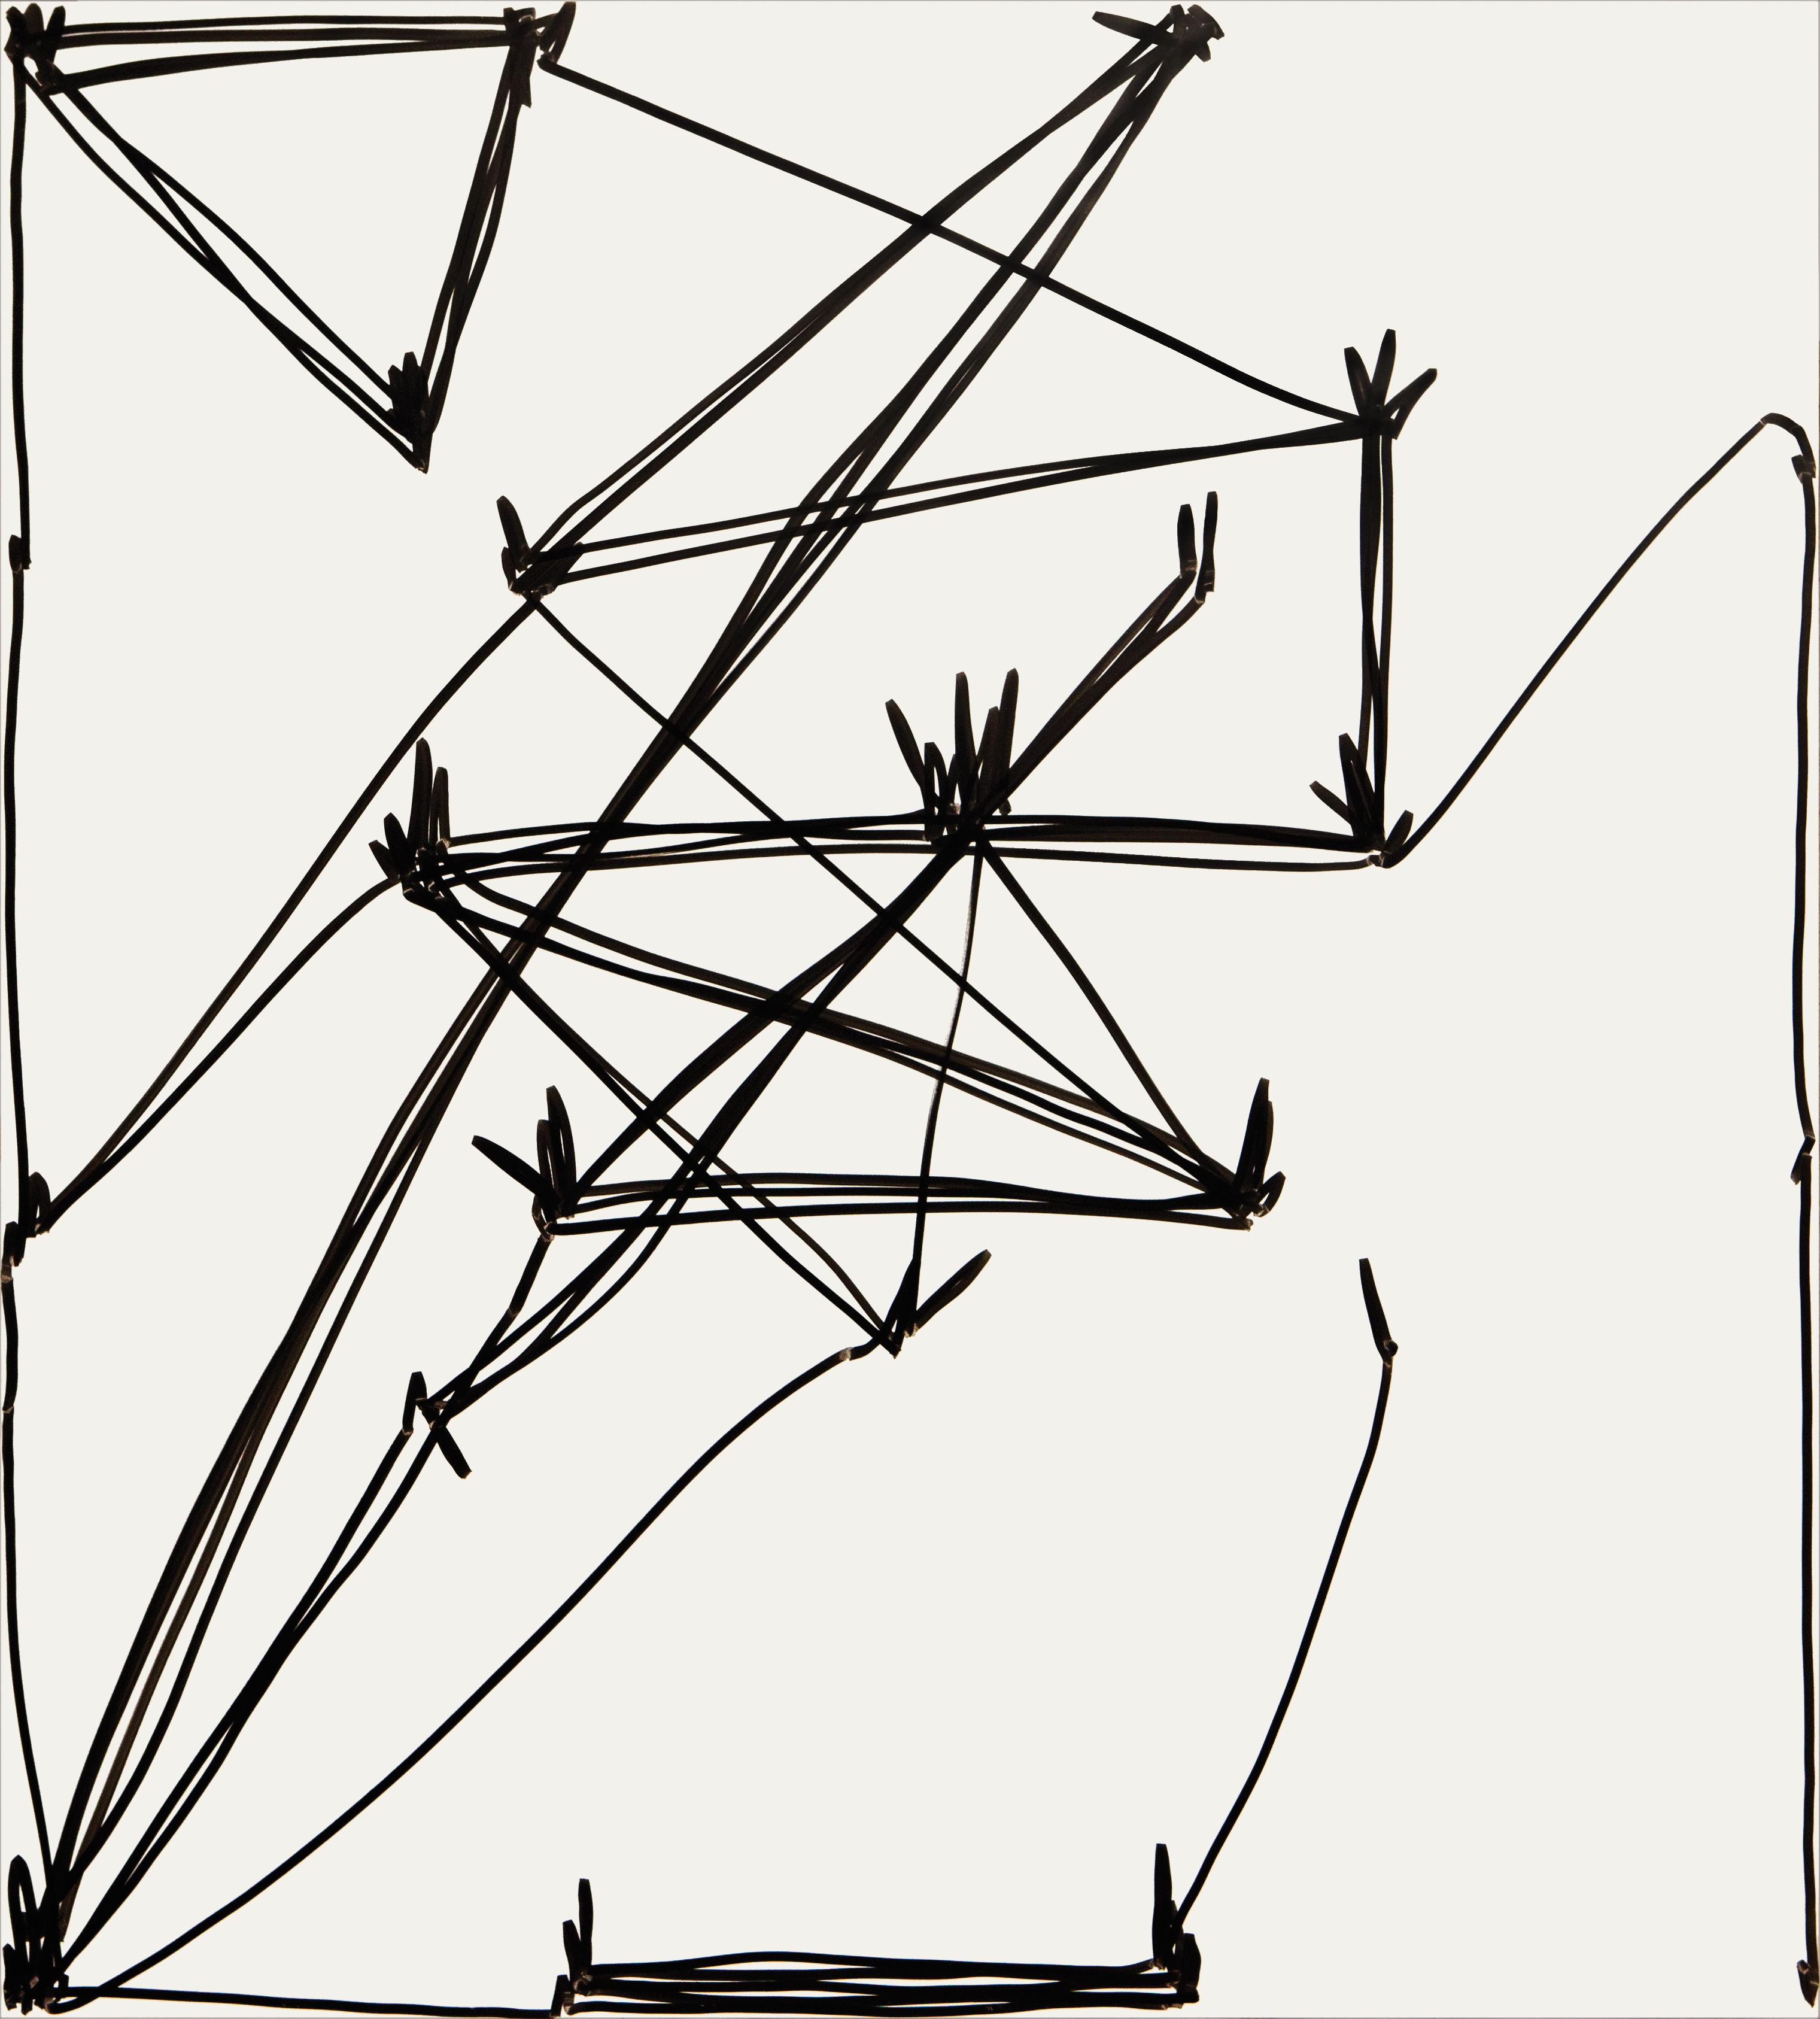 Fliege Oleksiy Koval, 2016 100 x 90 cm, marker on FPY Photo © Klaus Mauz